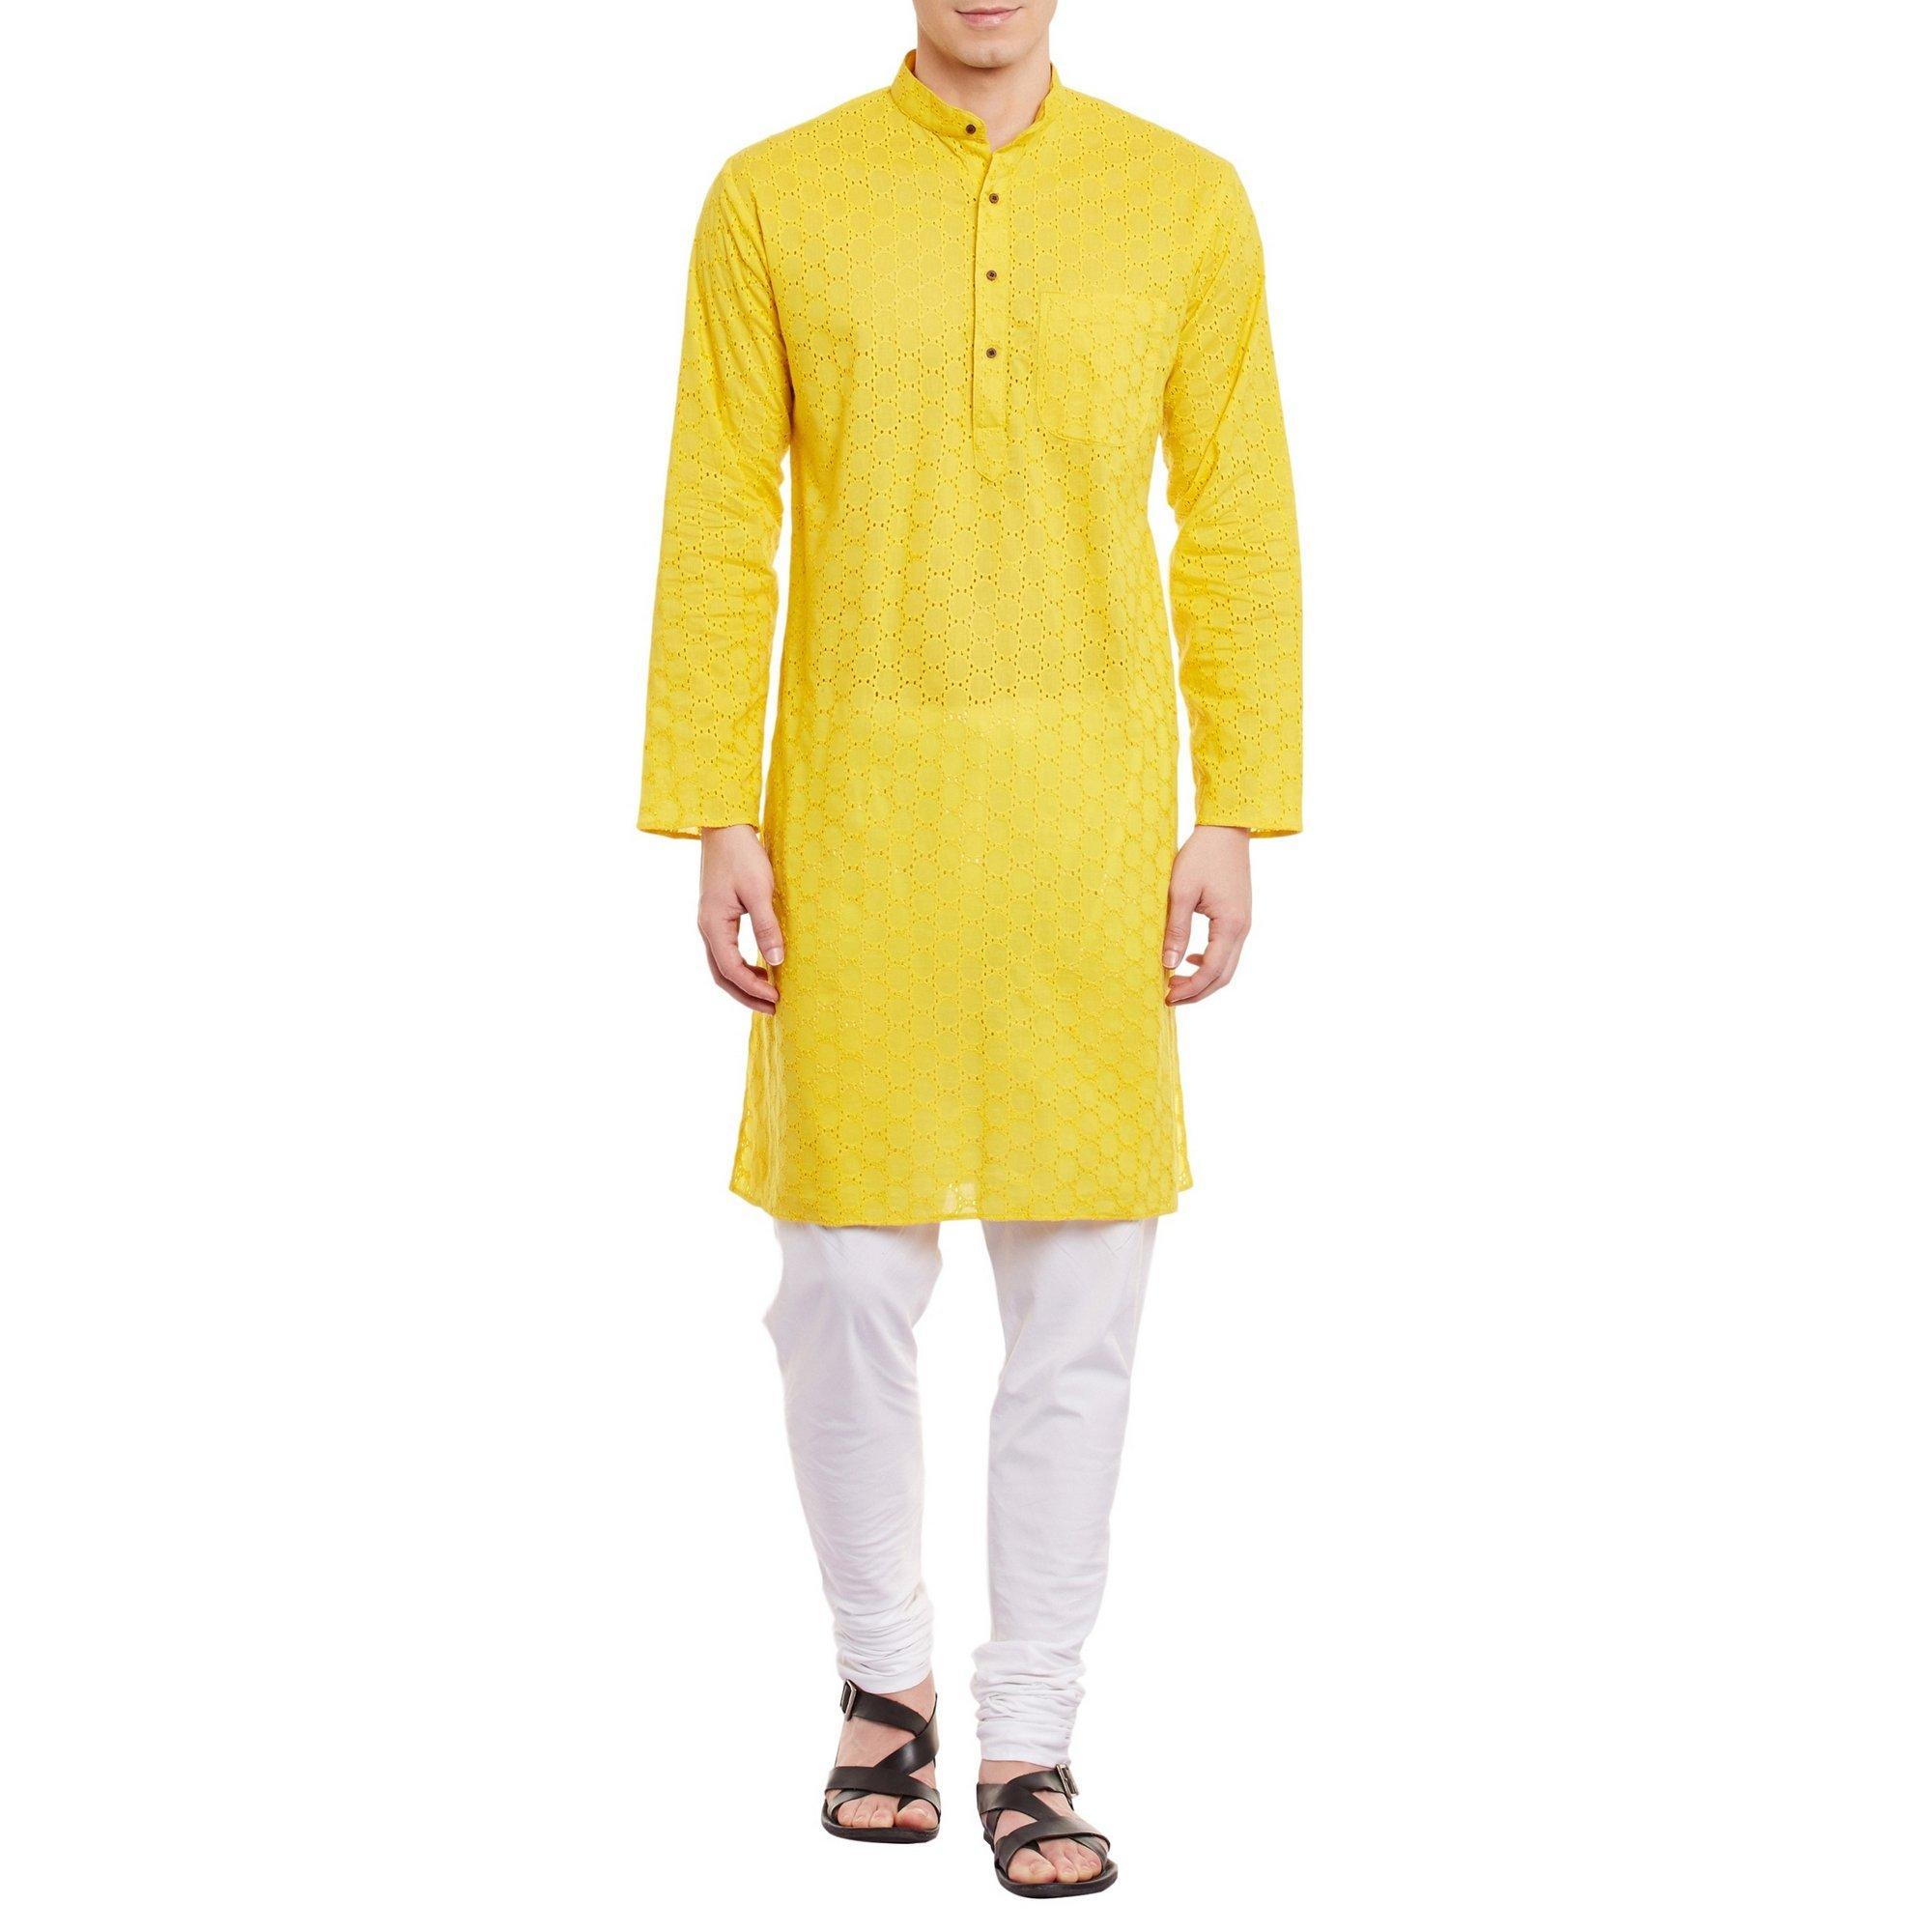 ShalinIndia Mens Embroidered Cutwork Cotton Kurta With Churidar Pajama Trousers Machine Embroidery,Yellow Chest Size: 38 Inch